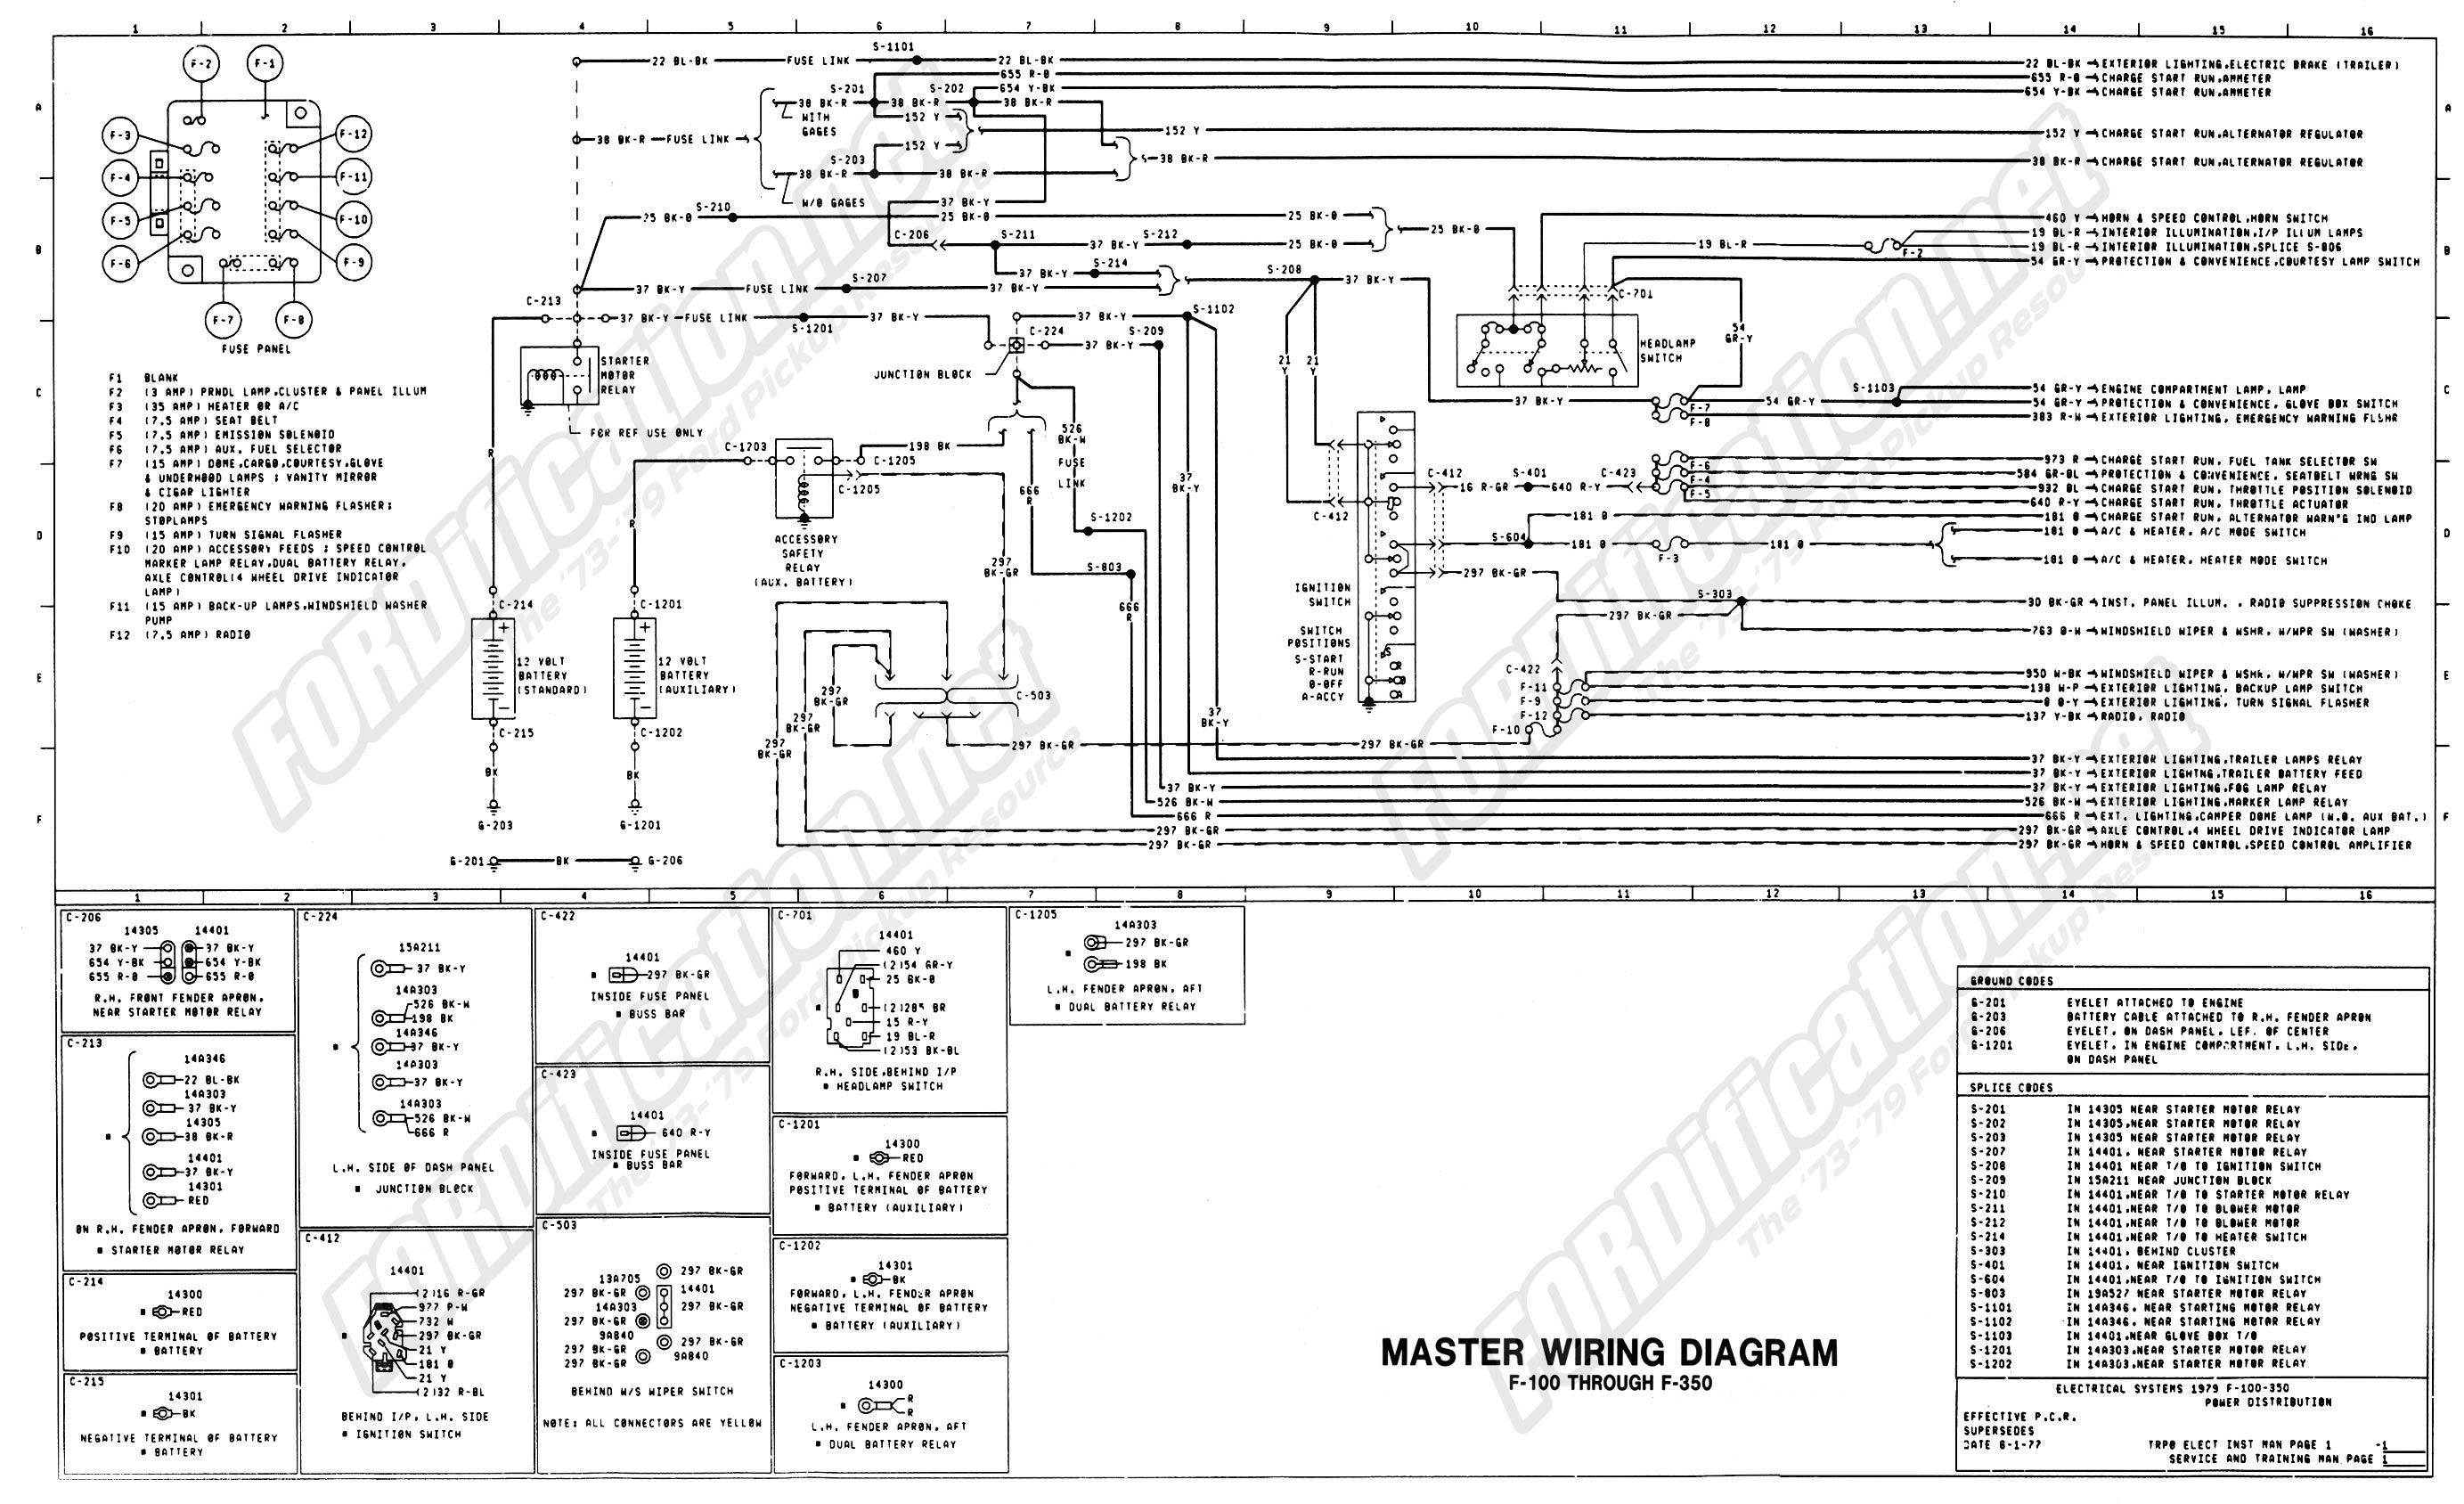 1995 chevy tahoe lights wiring diagram